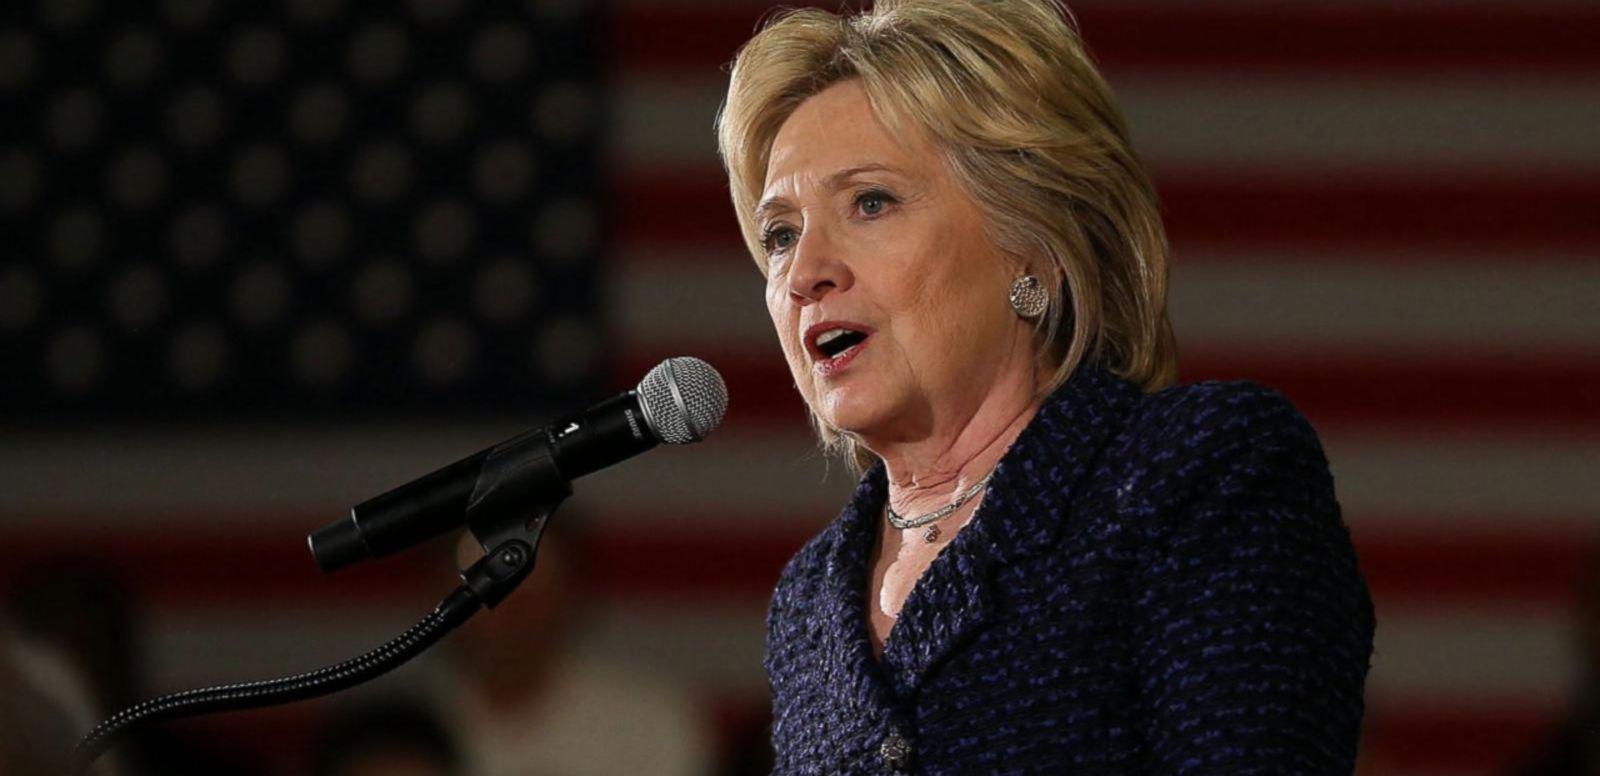 VIDEO: Race Tightening Between Bernie Sanders and Hillary Clinton